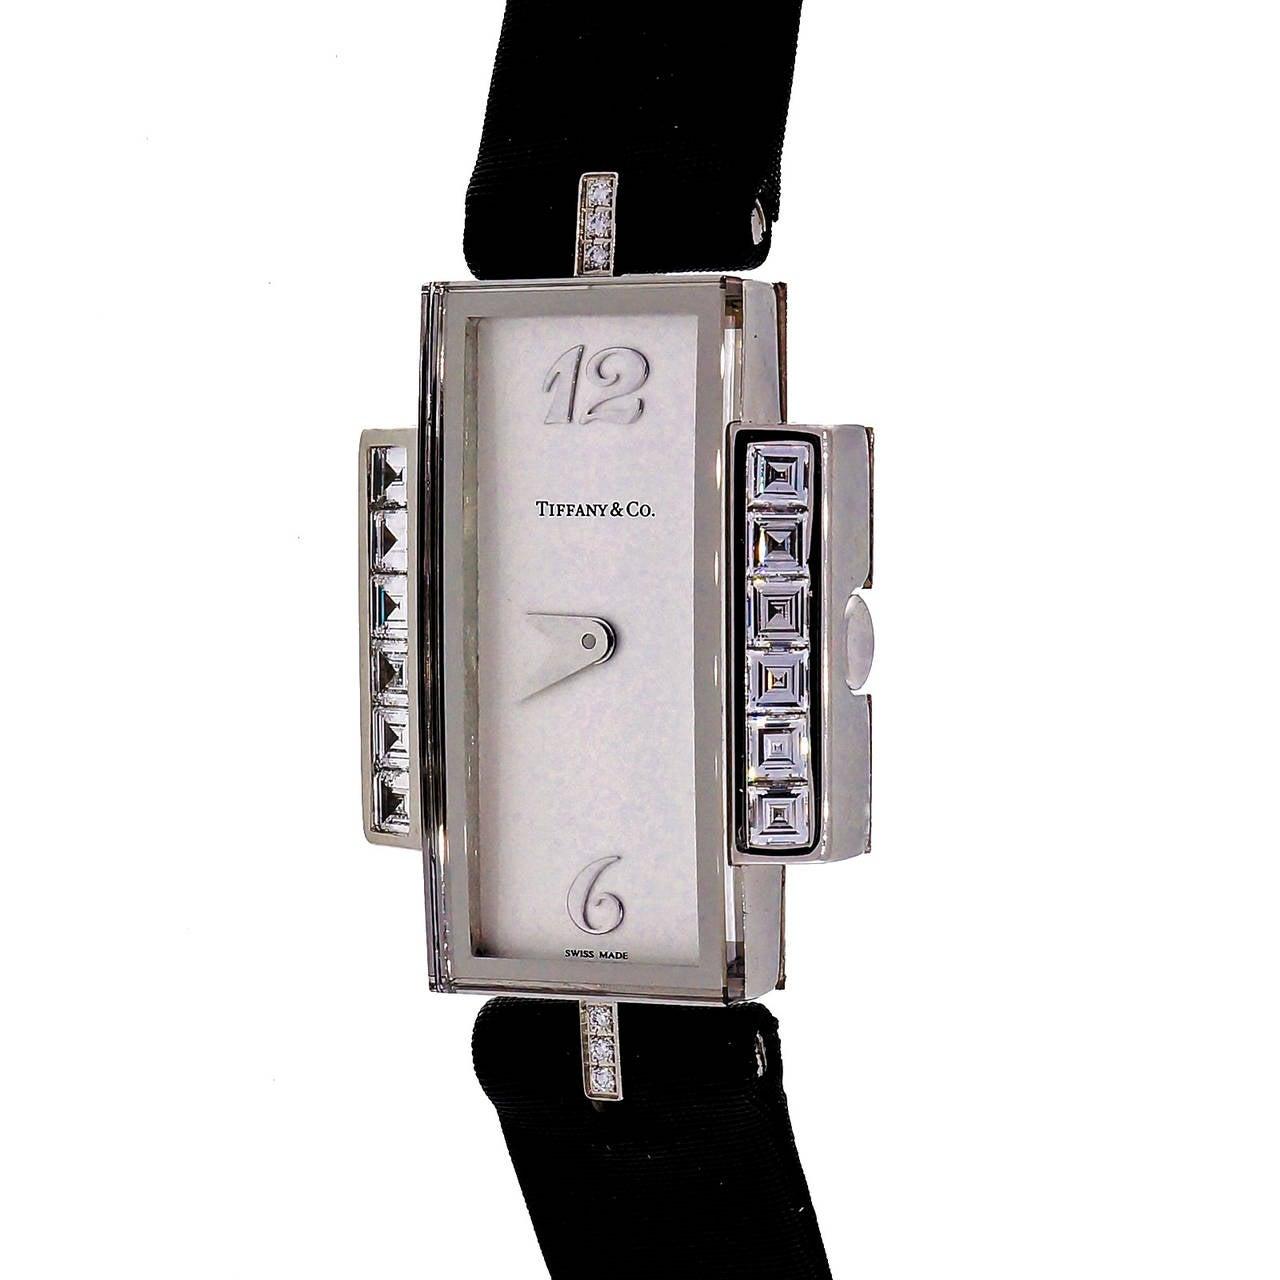 Tiffany & Co Lady's White Gold and Diamond Wristwatch 3